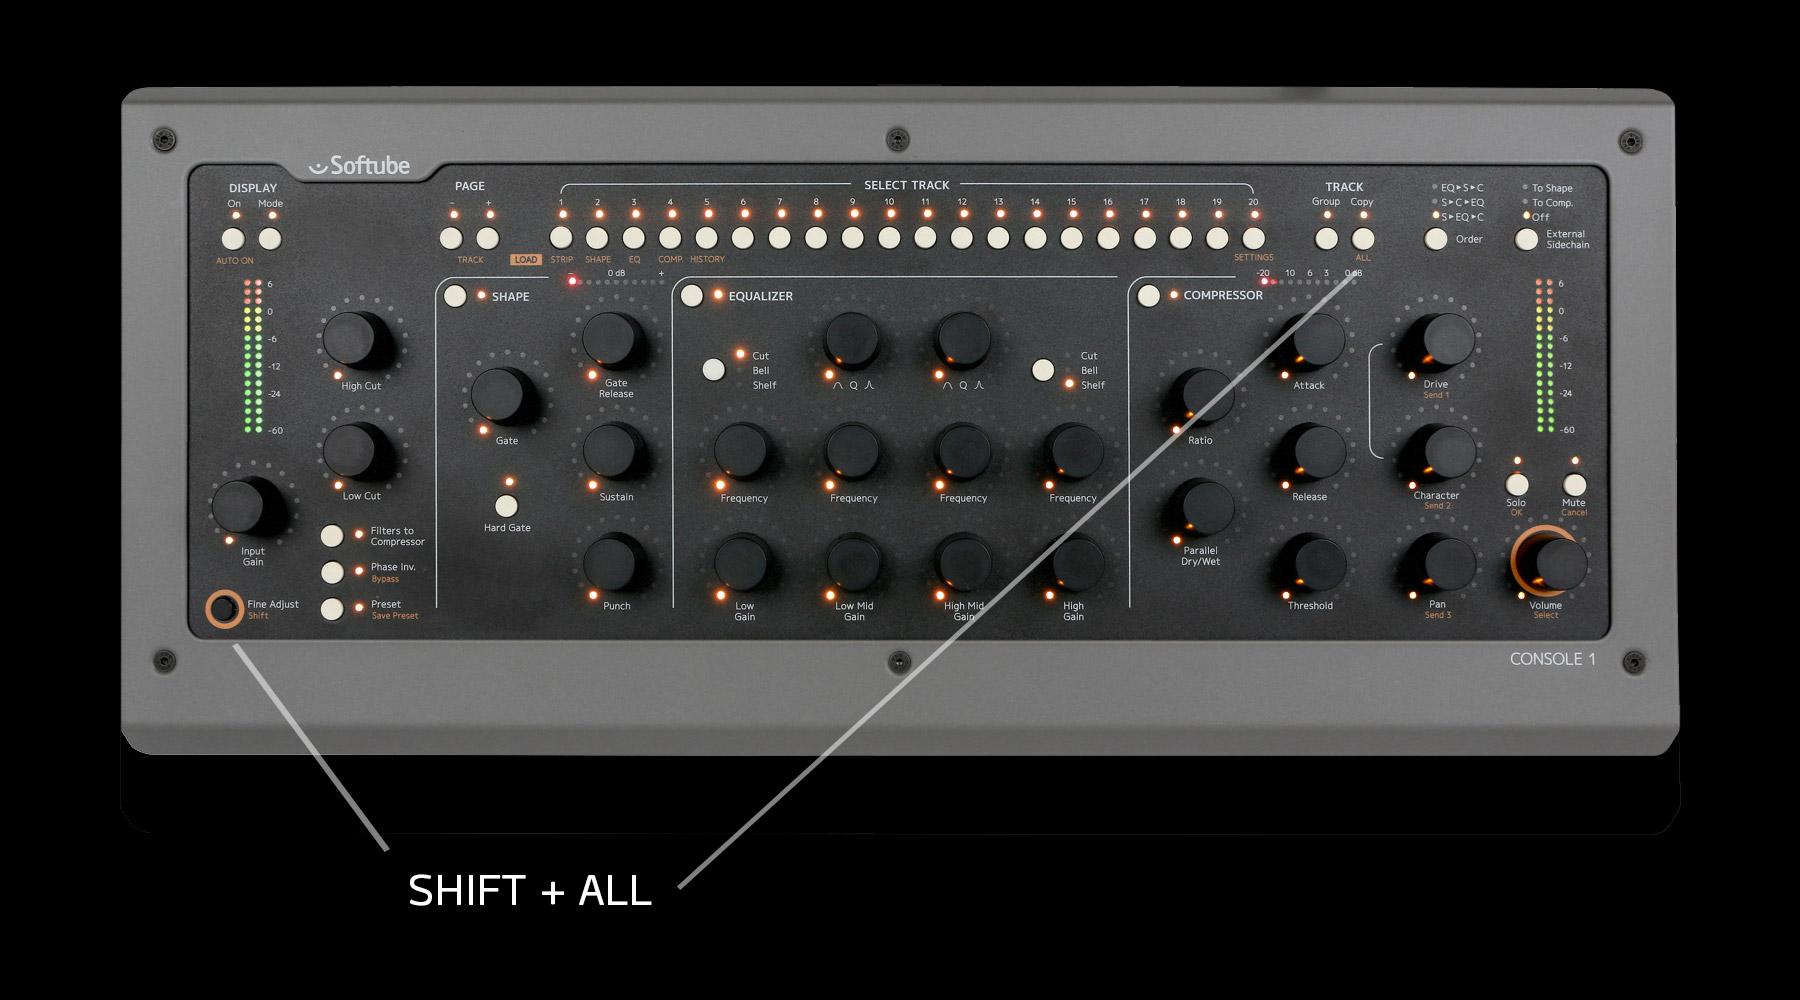 5-trucos-para-Console-1-Screenshot-1